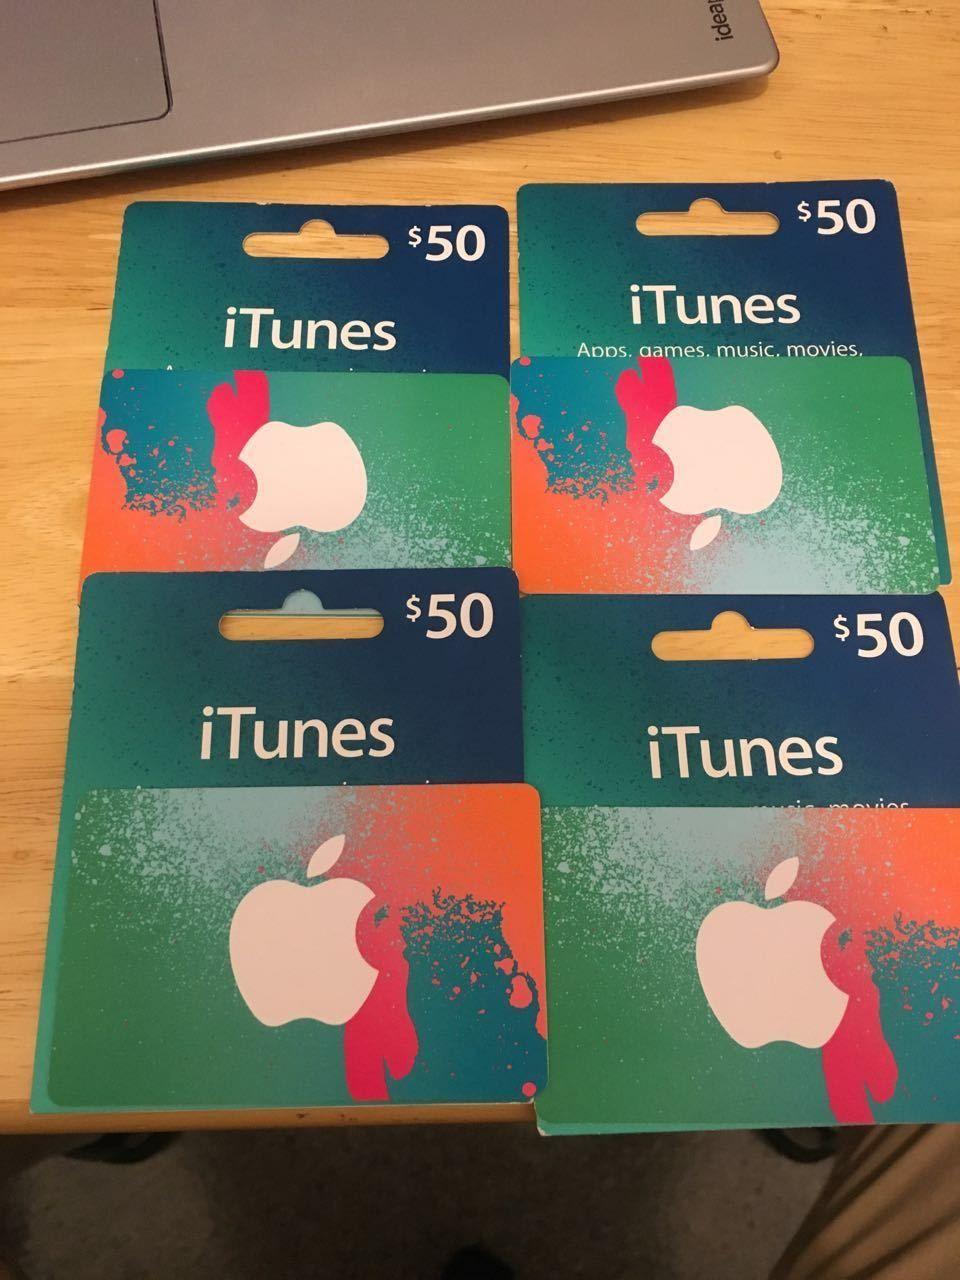 iTunes Gifts 2020 Free Generator